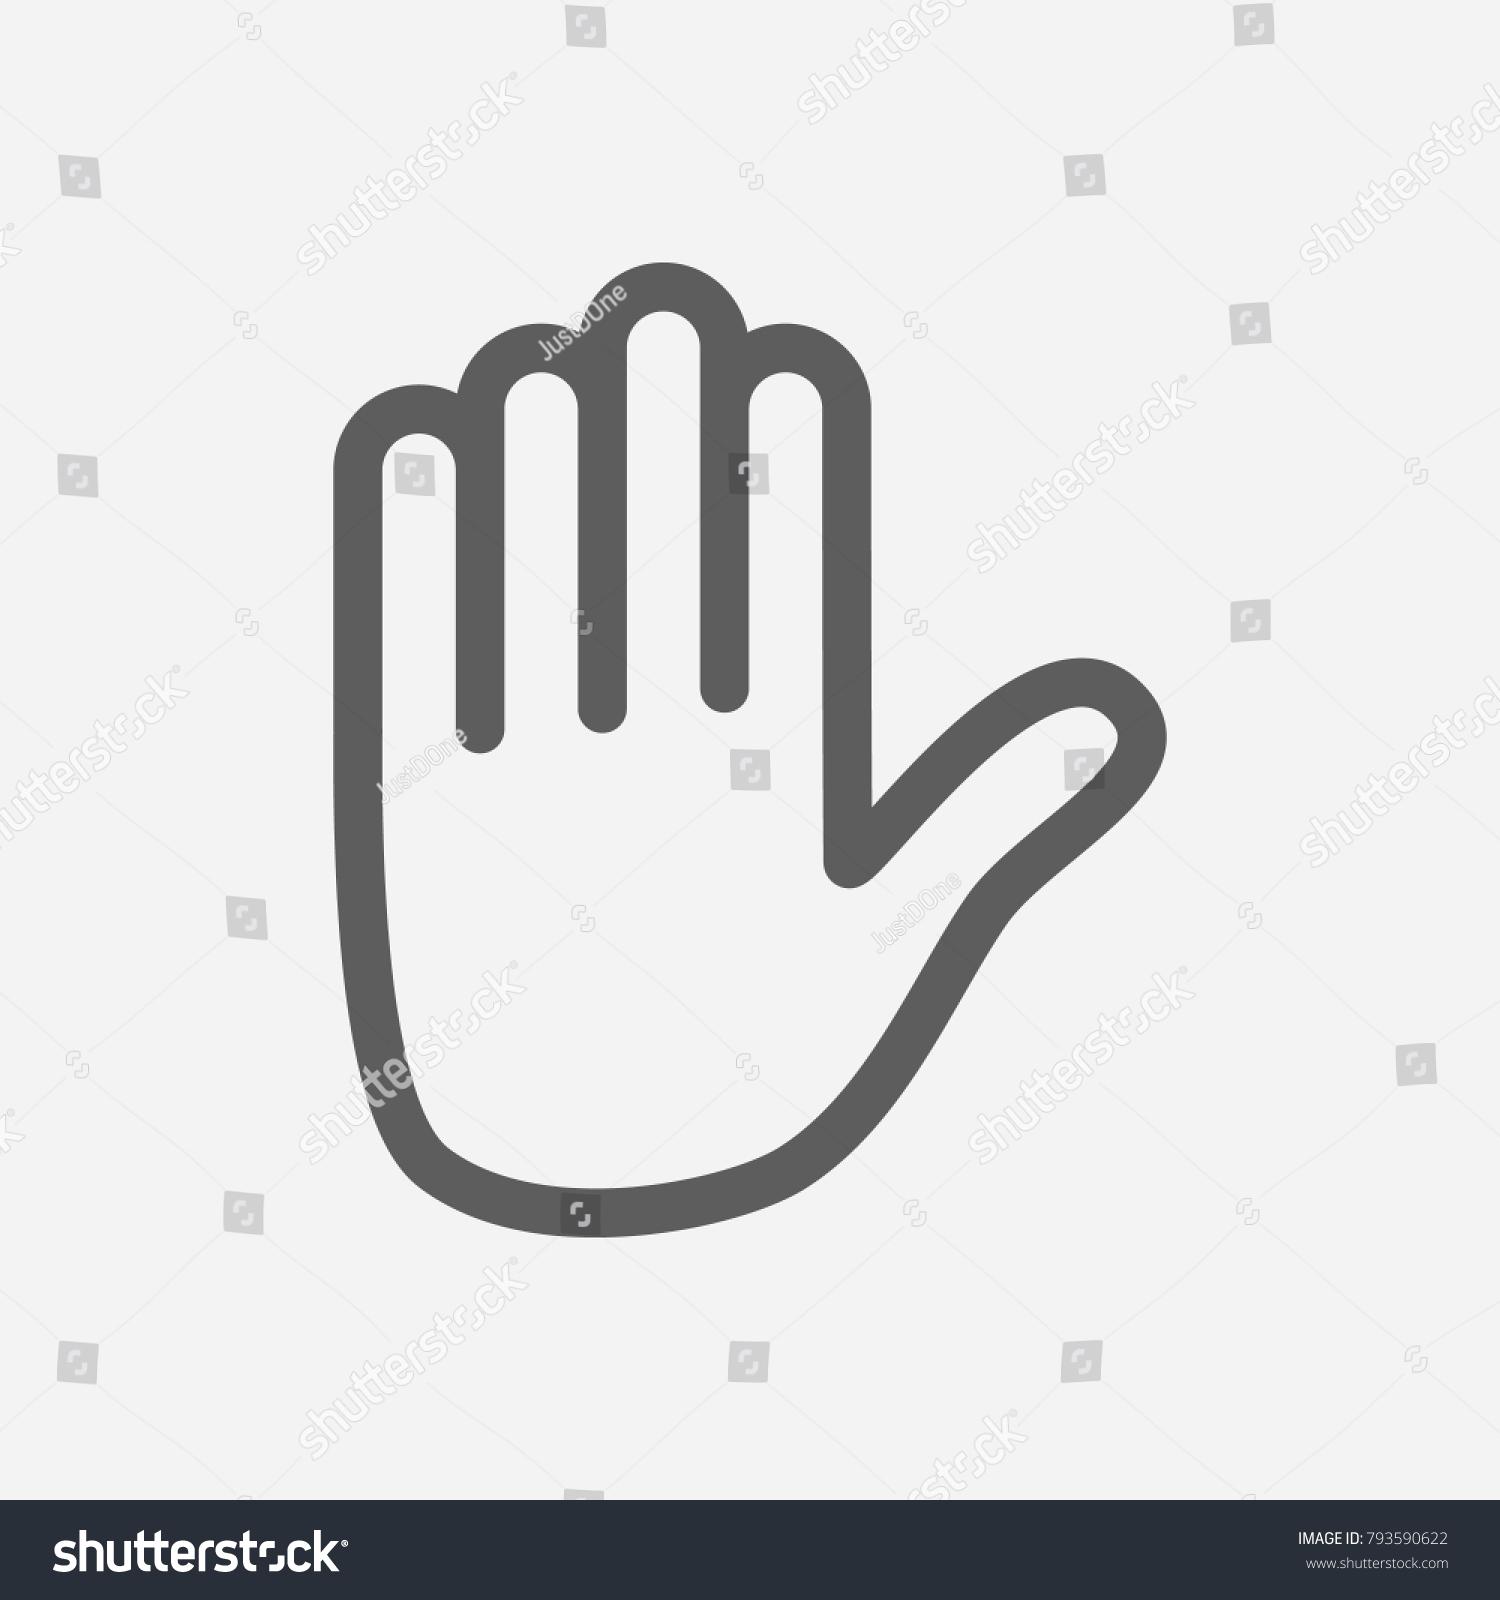 Emoji hand symbols gallery symbol and sign ideas emoji hand icon line symbol isolated stock illustration 793590622 emoji hand icon line symbol isolated illustration buycottarizona